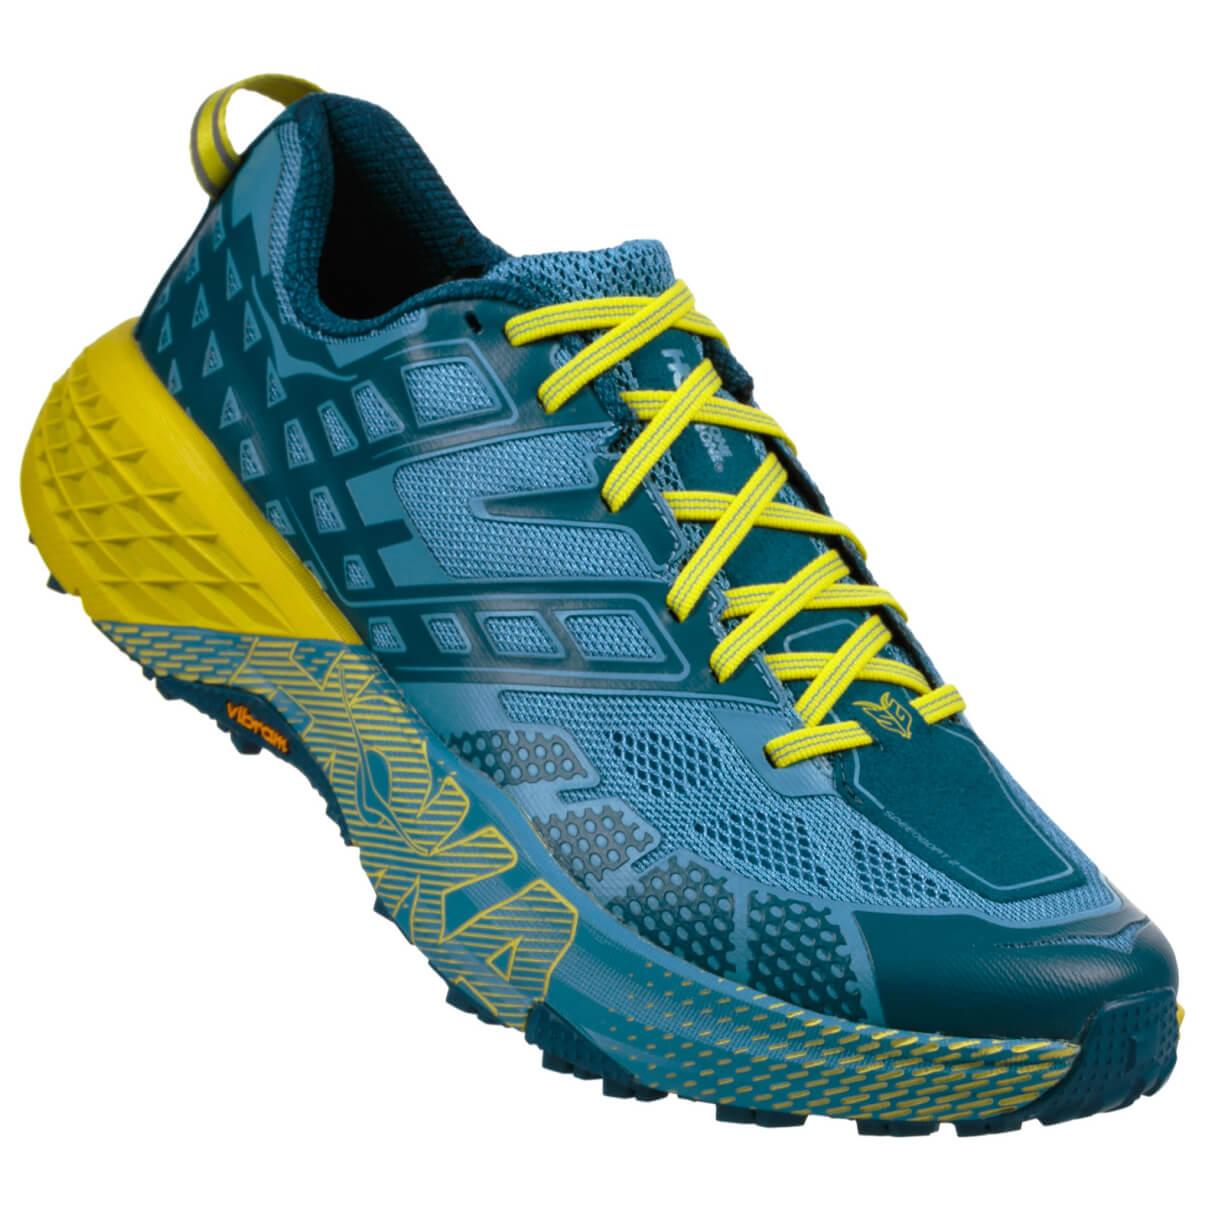 Mountain Goat Running Shoes